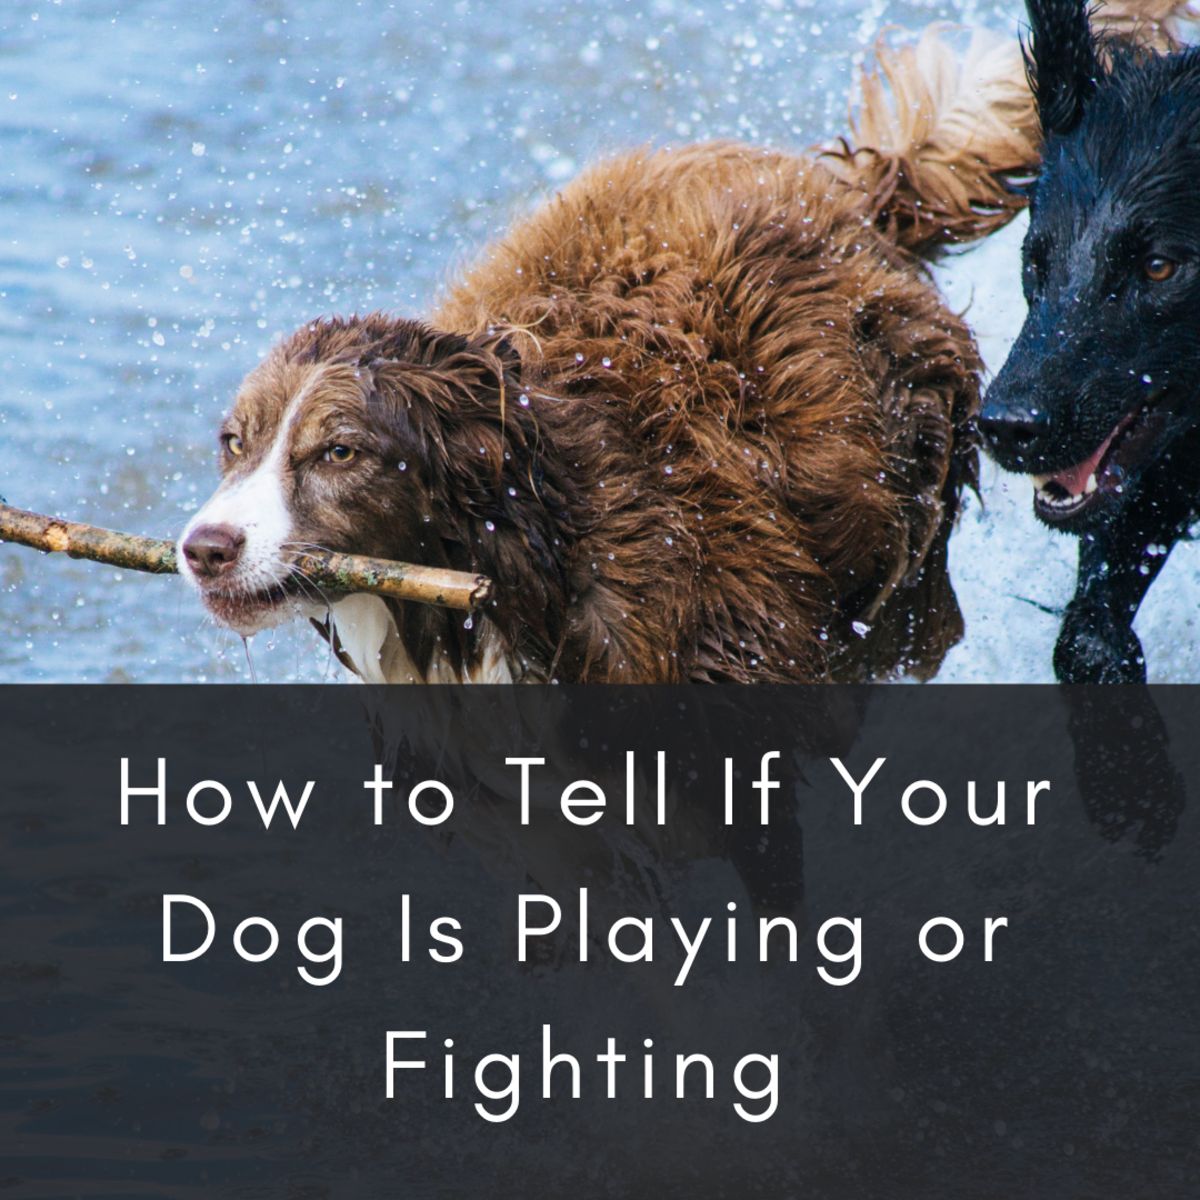 Sometimes dog play looks a lot like dog fighting.